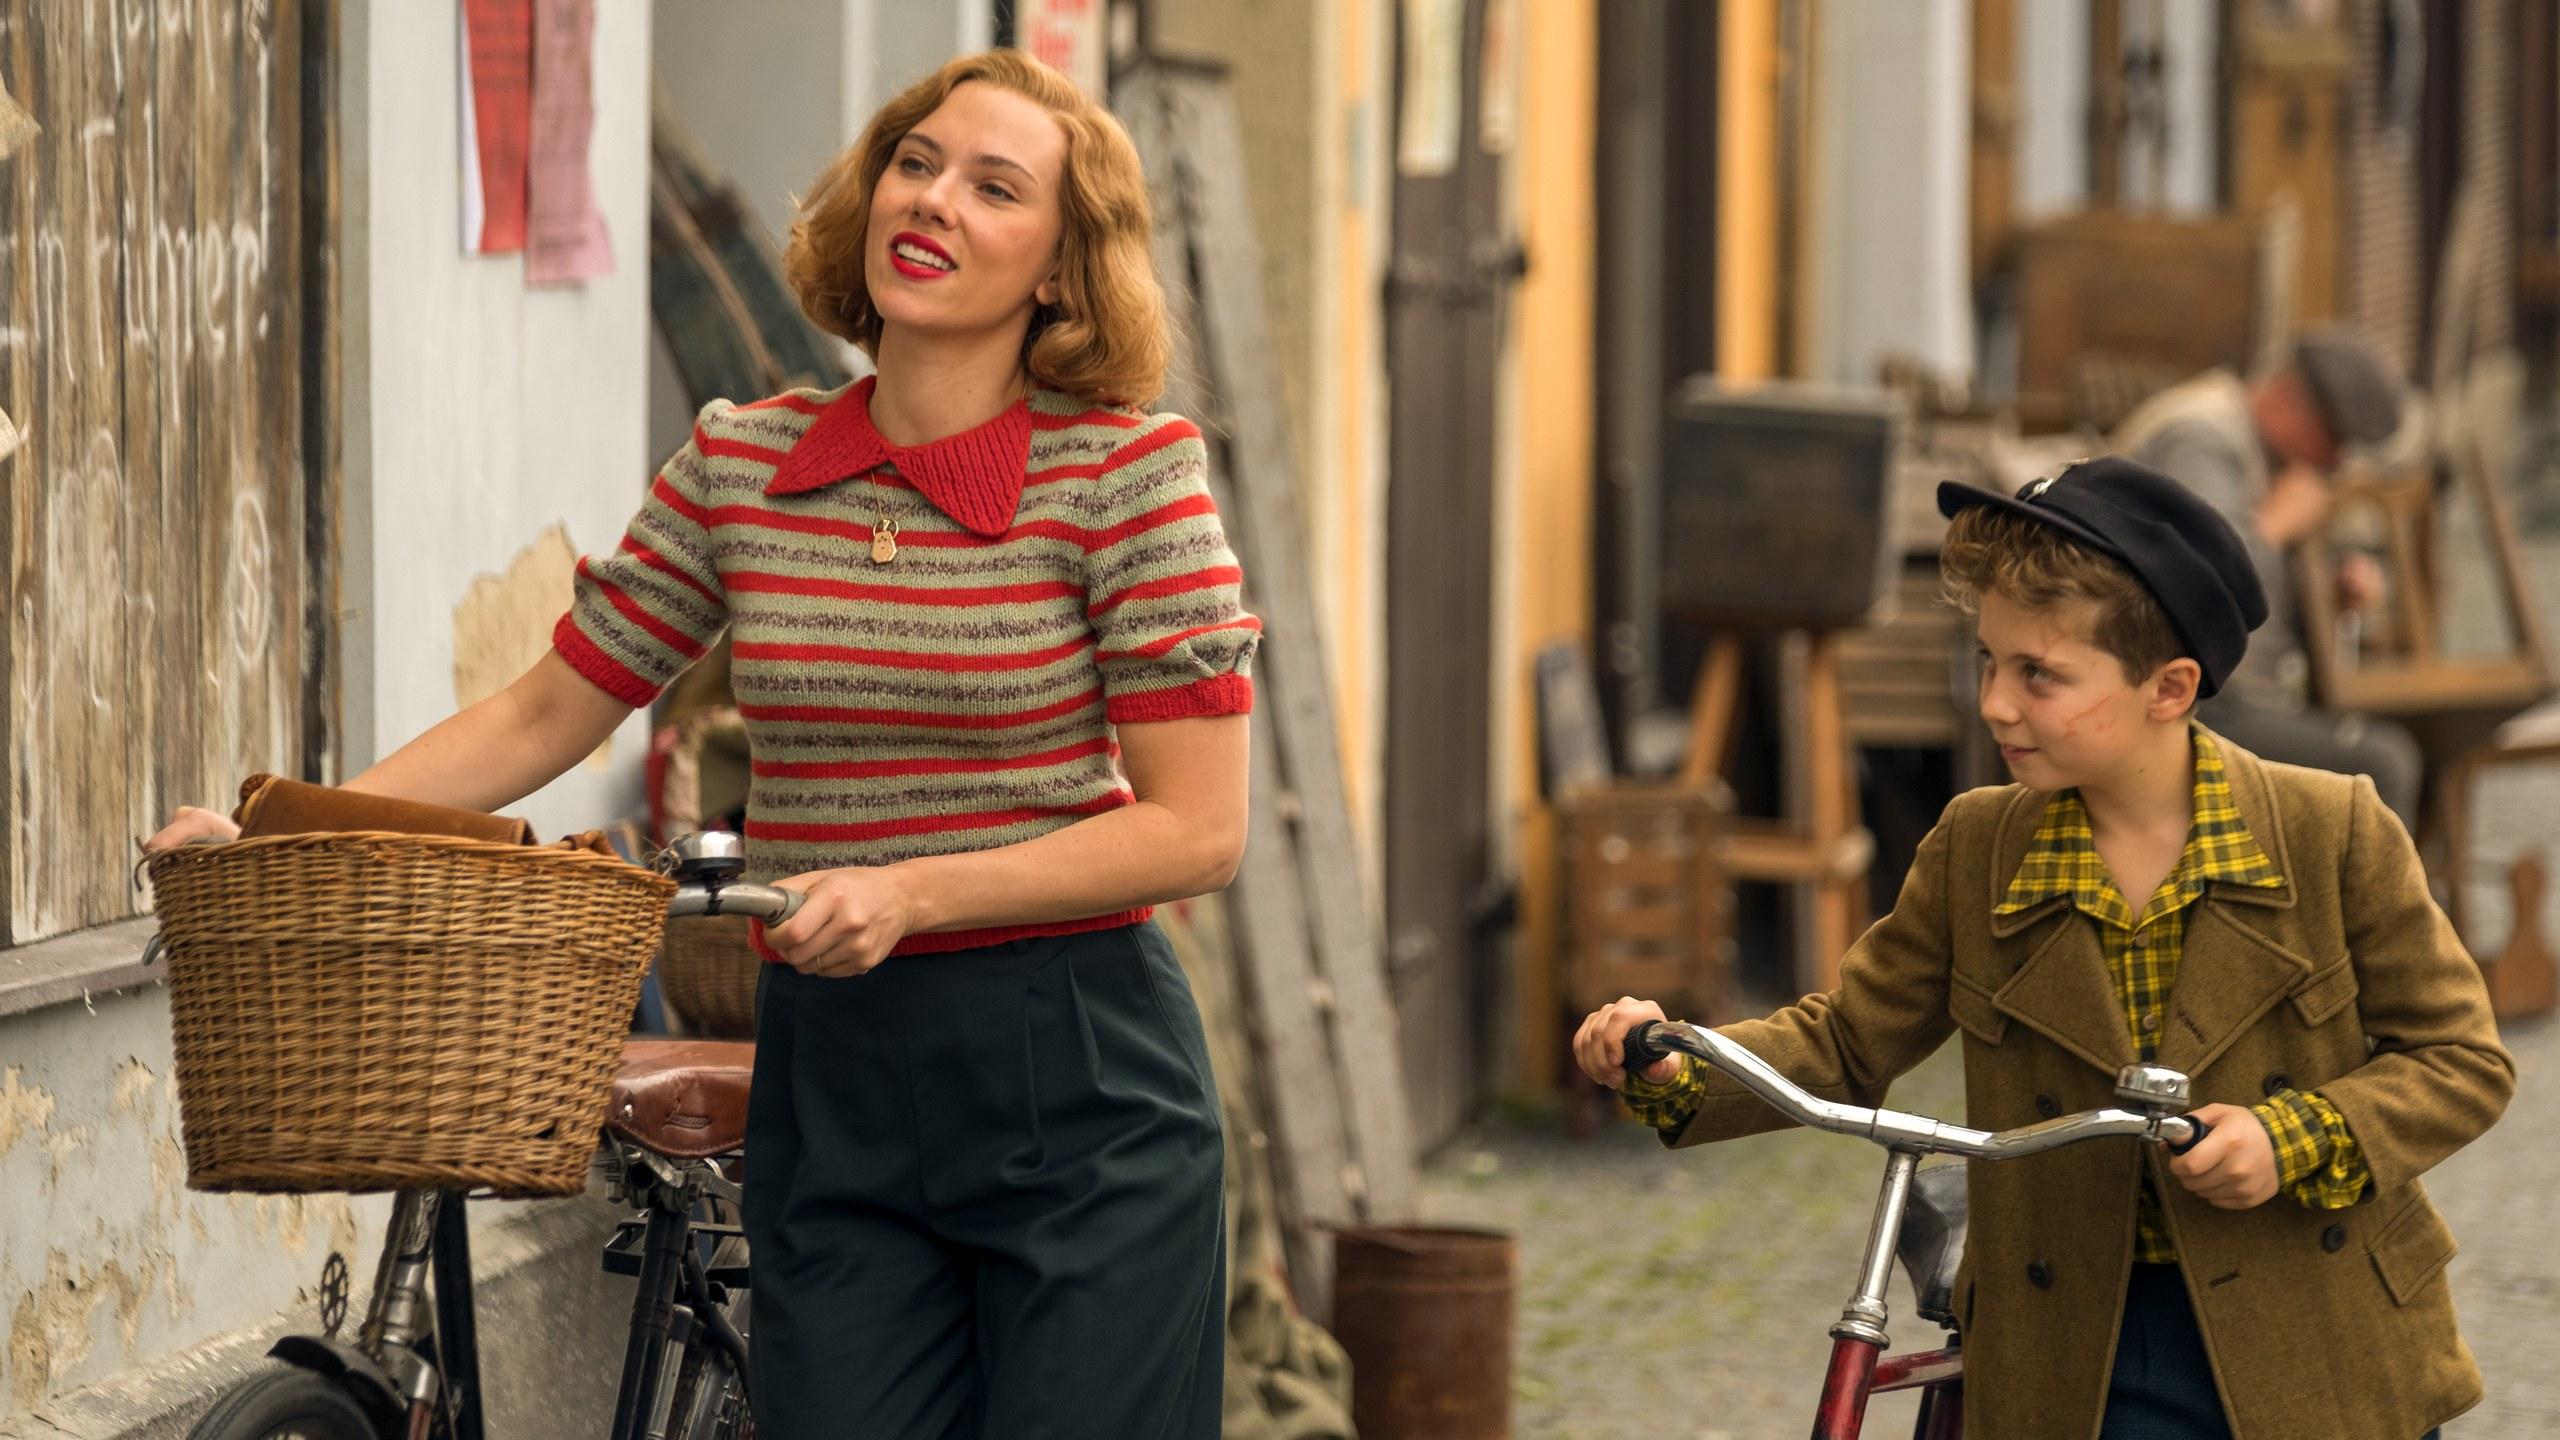 JoJo y Rosie (Scarlett Johansson) en JoJo Rabbit